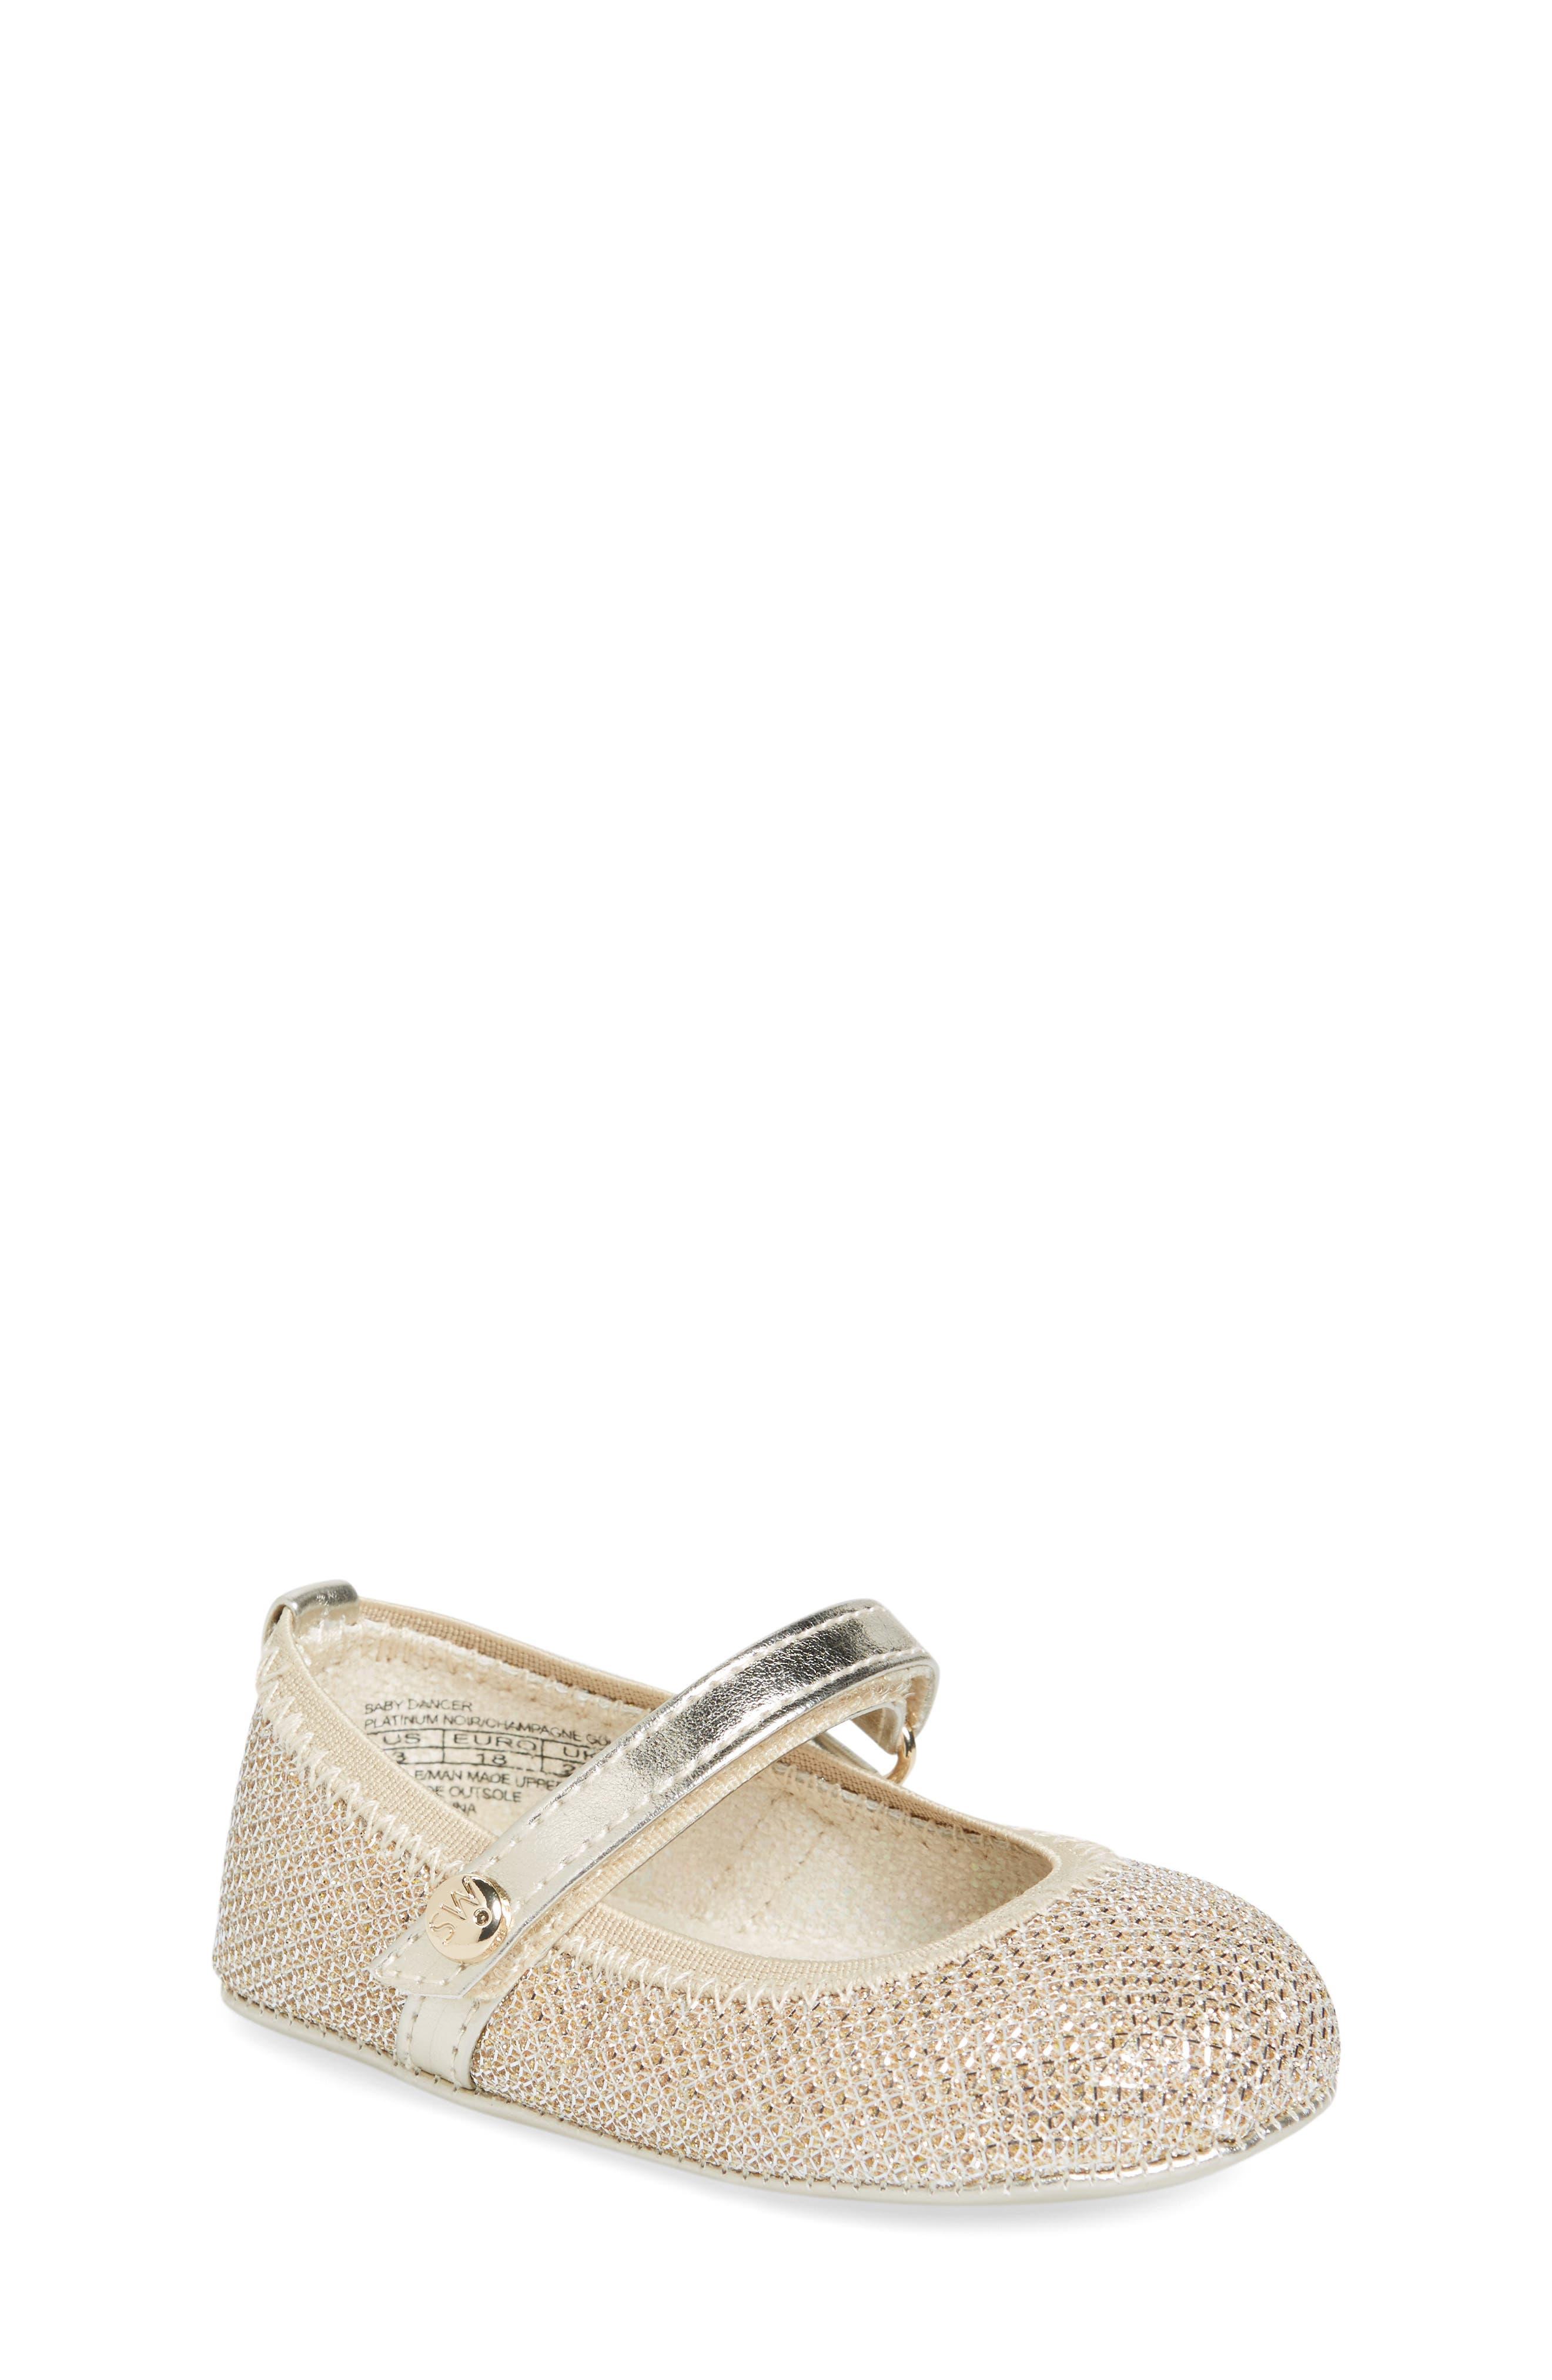 Baby Dancer Crib Shoe,                         Main,                         color, Platinum Gold